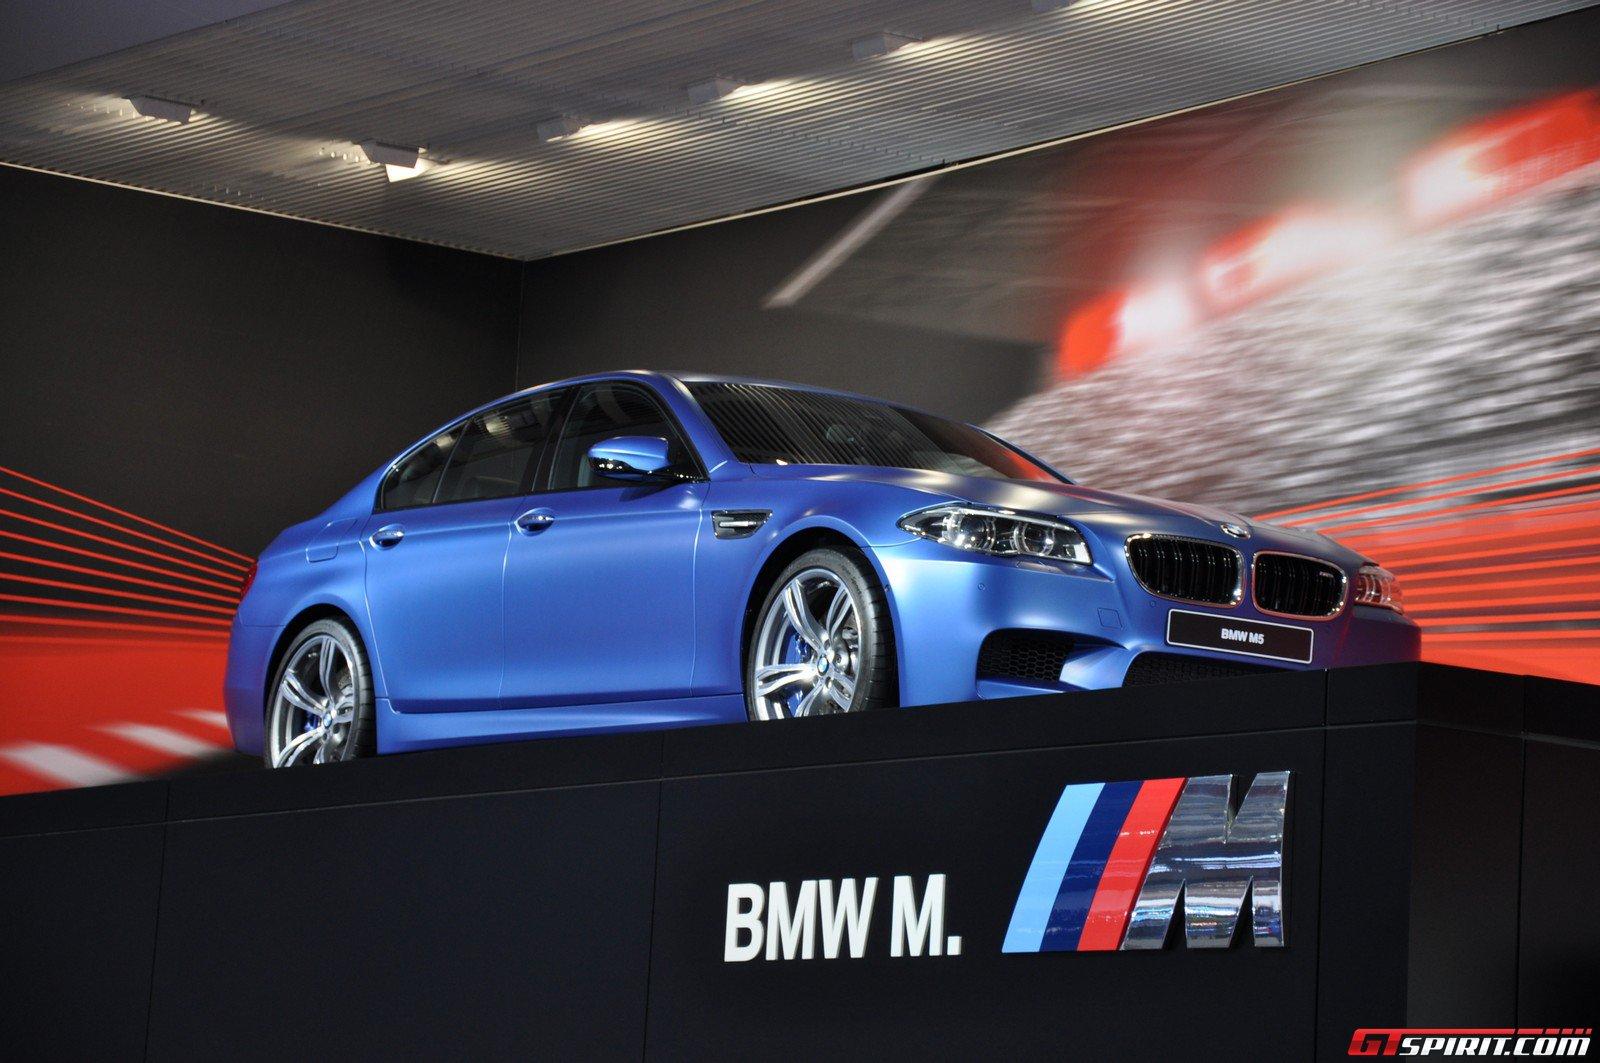 Brussels 2014 : BMW M3 Sedan & M4 Coupé - GTspirit